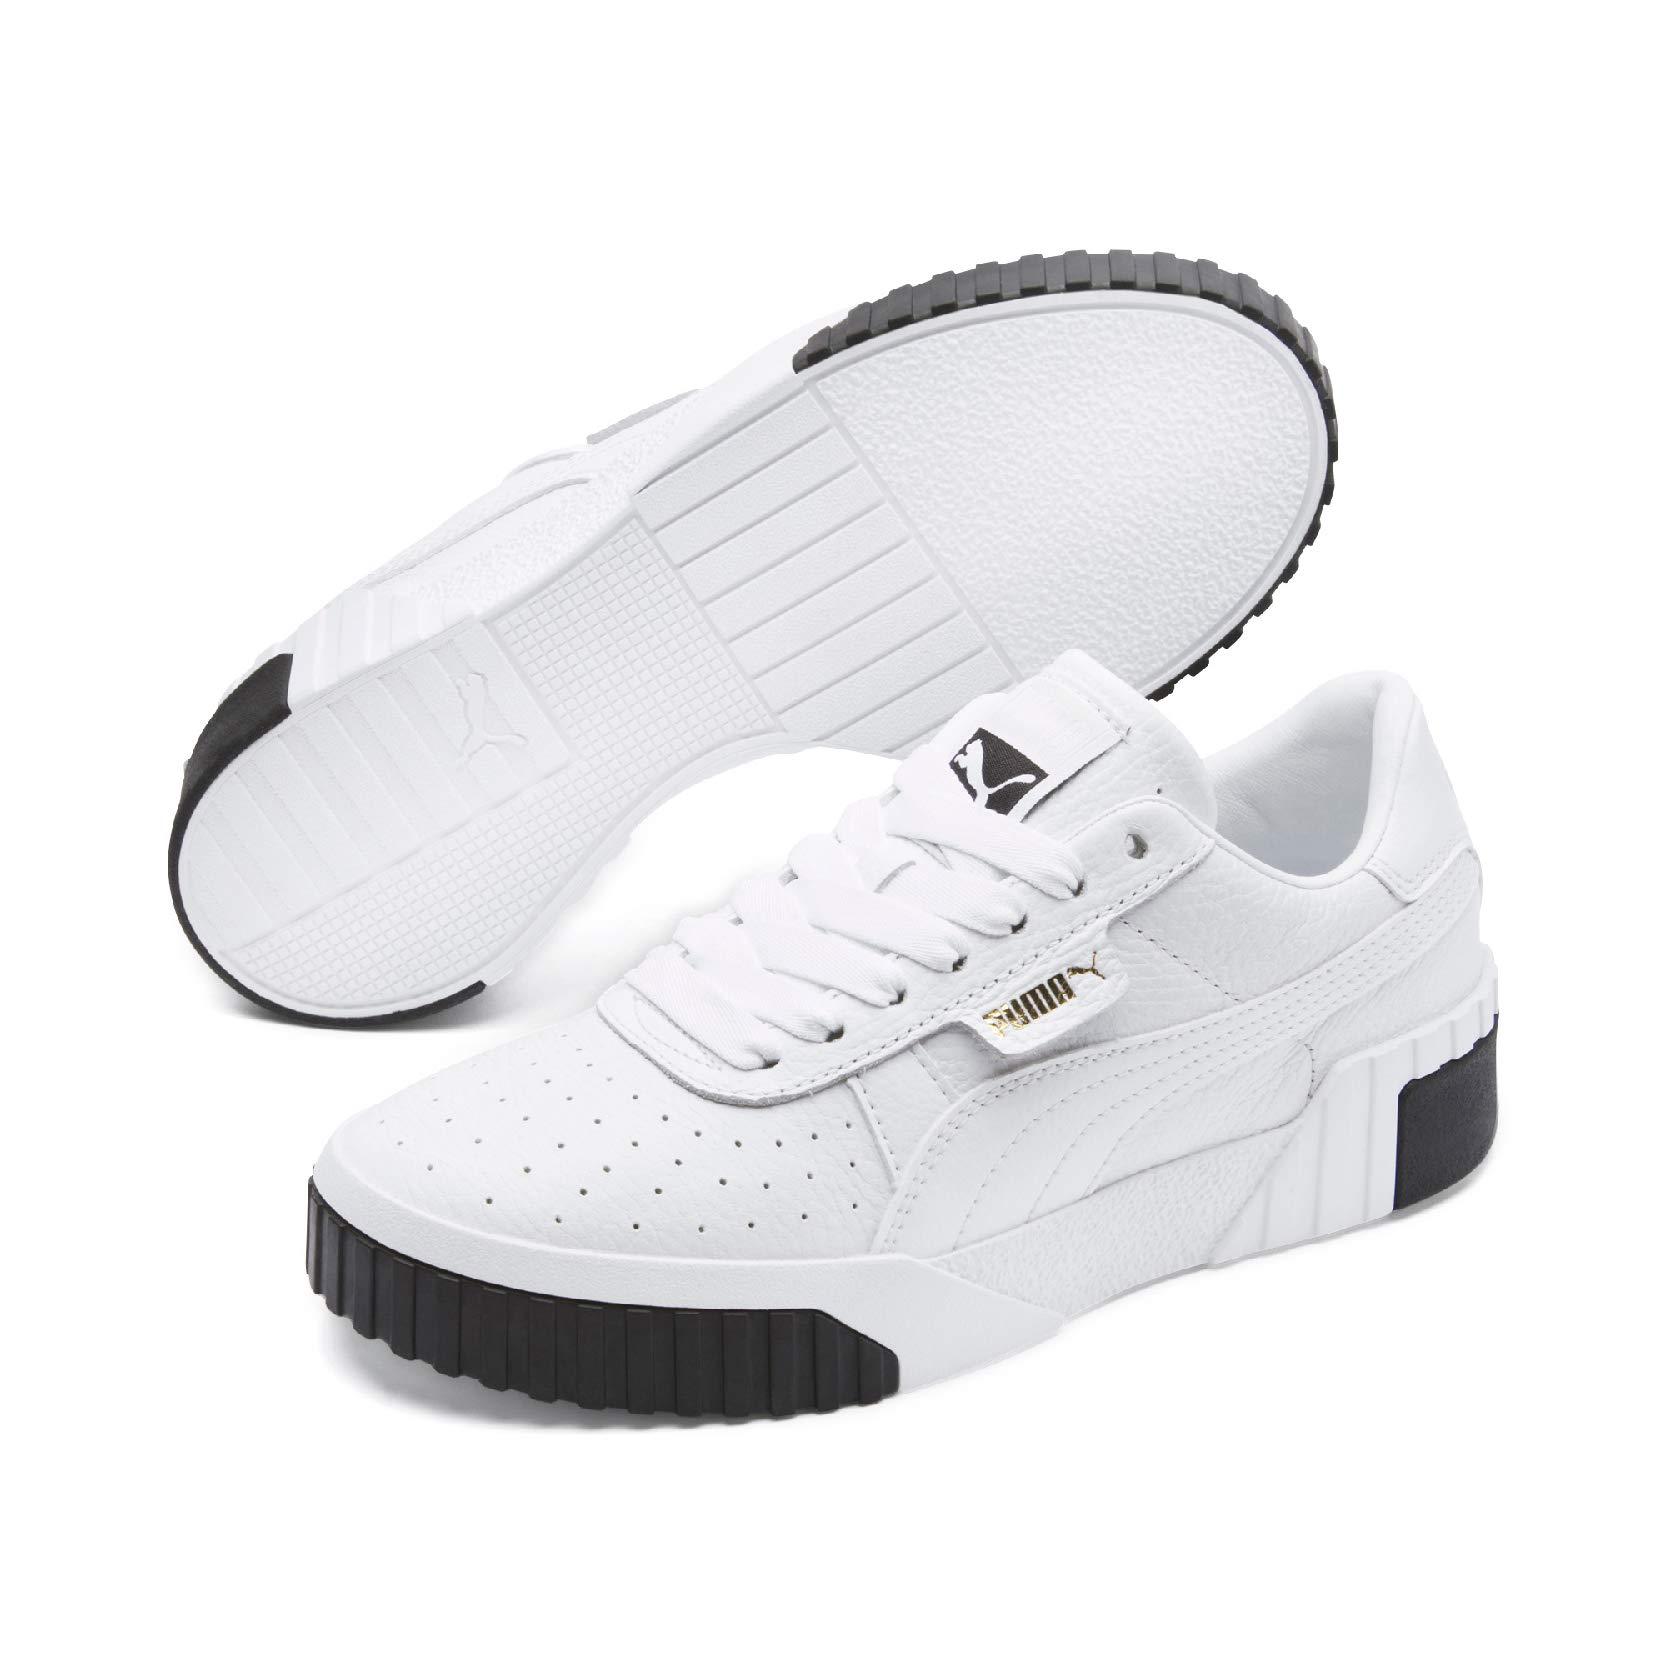 PUMA Women's Shoes White Black Cali Sneaker Fall Winter 2019